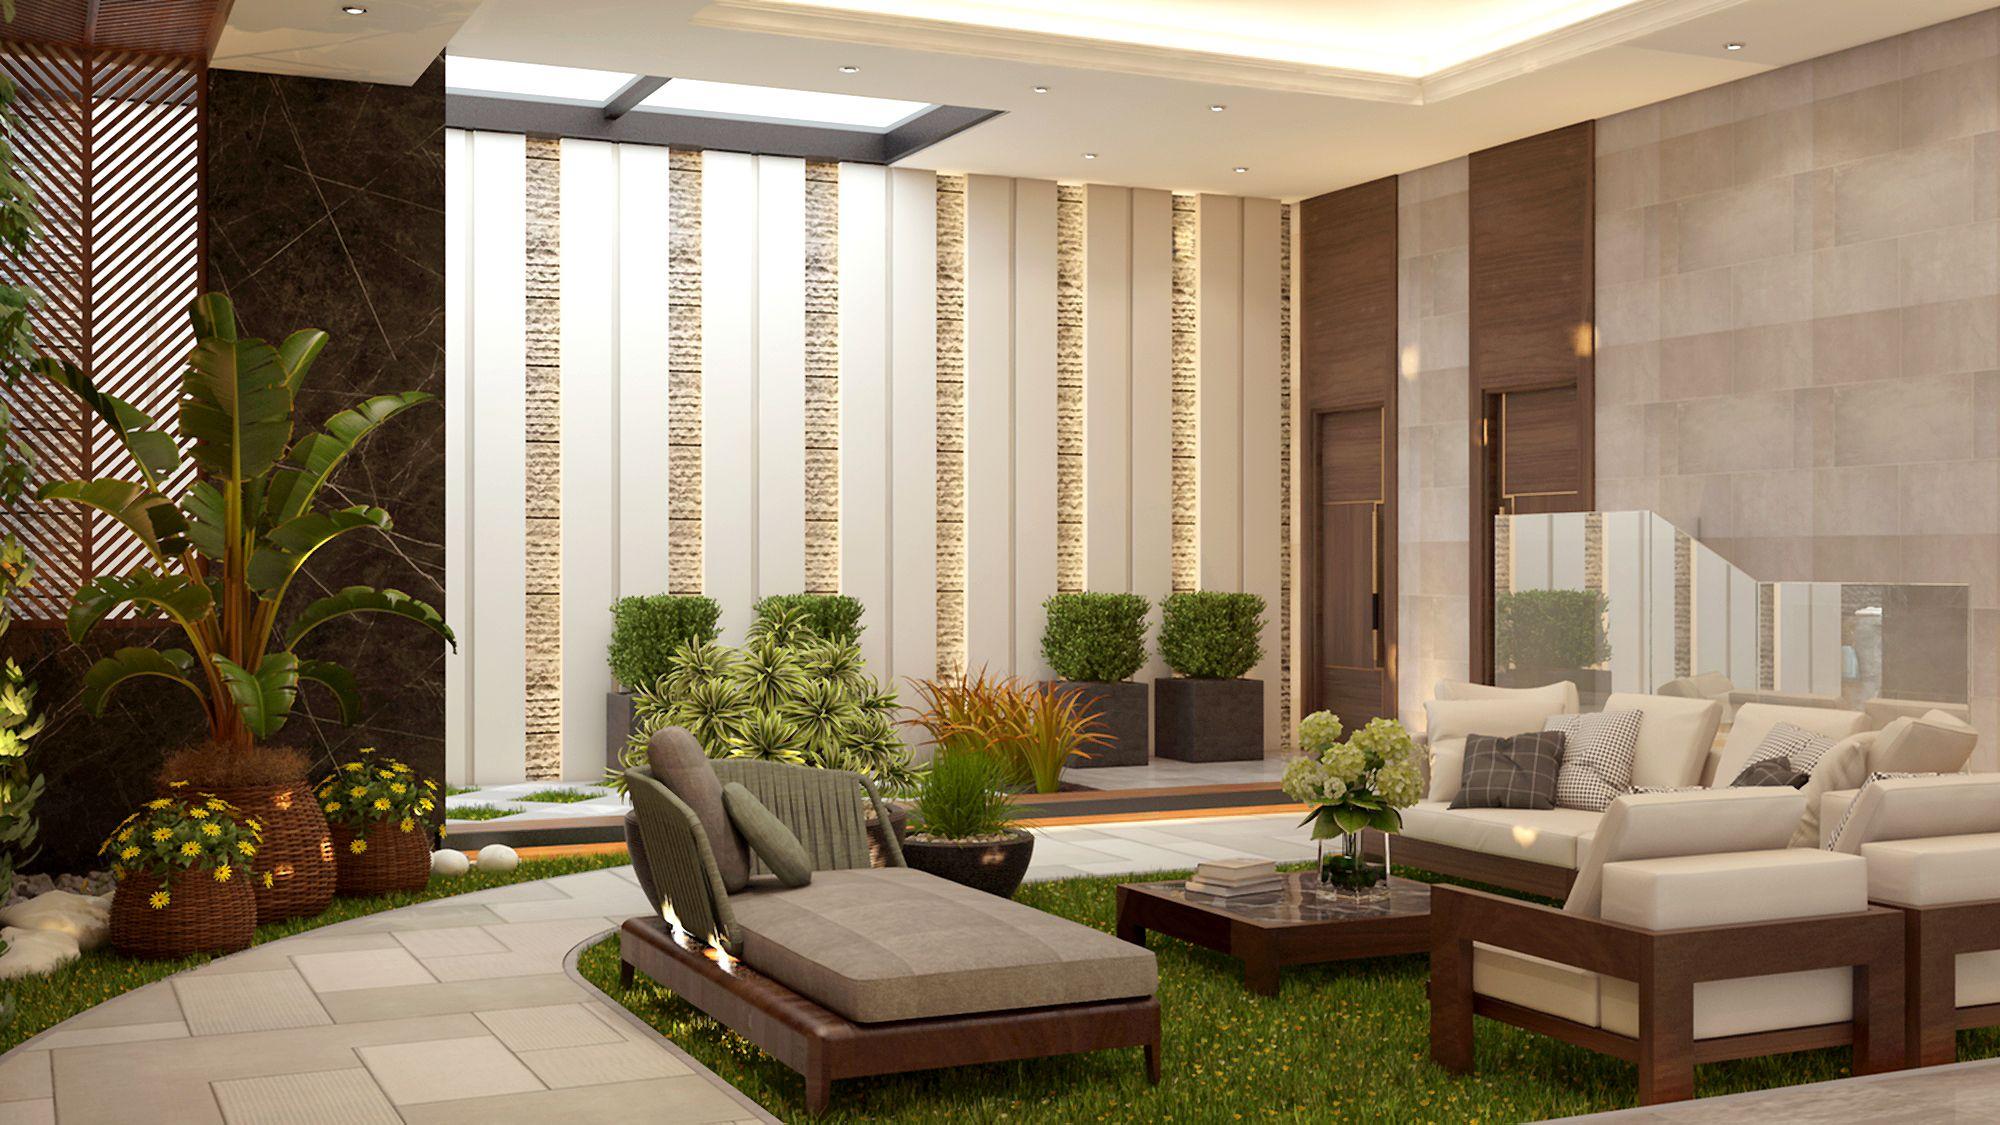 Top Interior Trends We Love in 2020 – INVERSE ARCHITECTURE ...